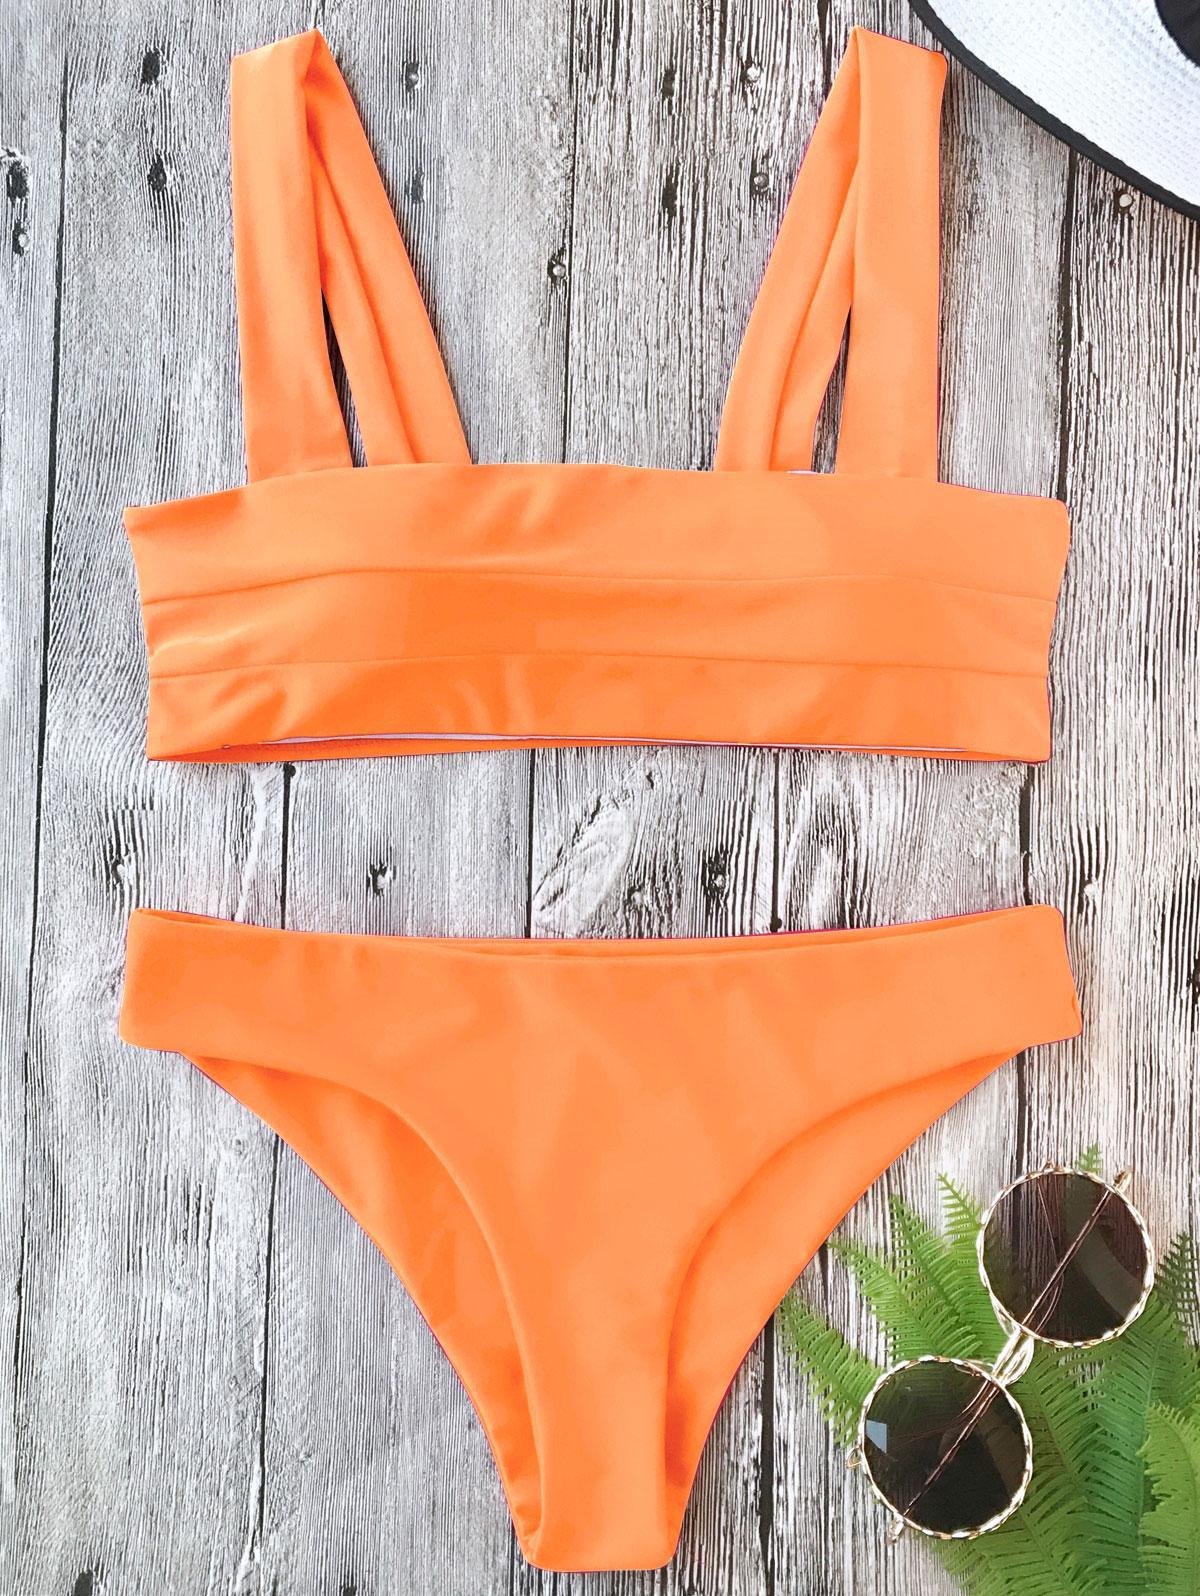 Padded Wide Straps Bandeau Neon Bikini Set